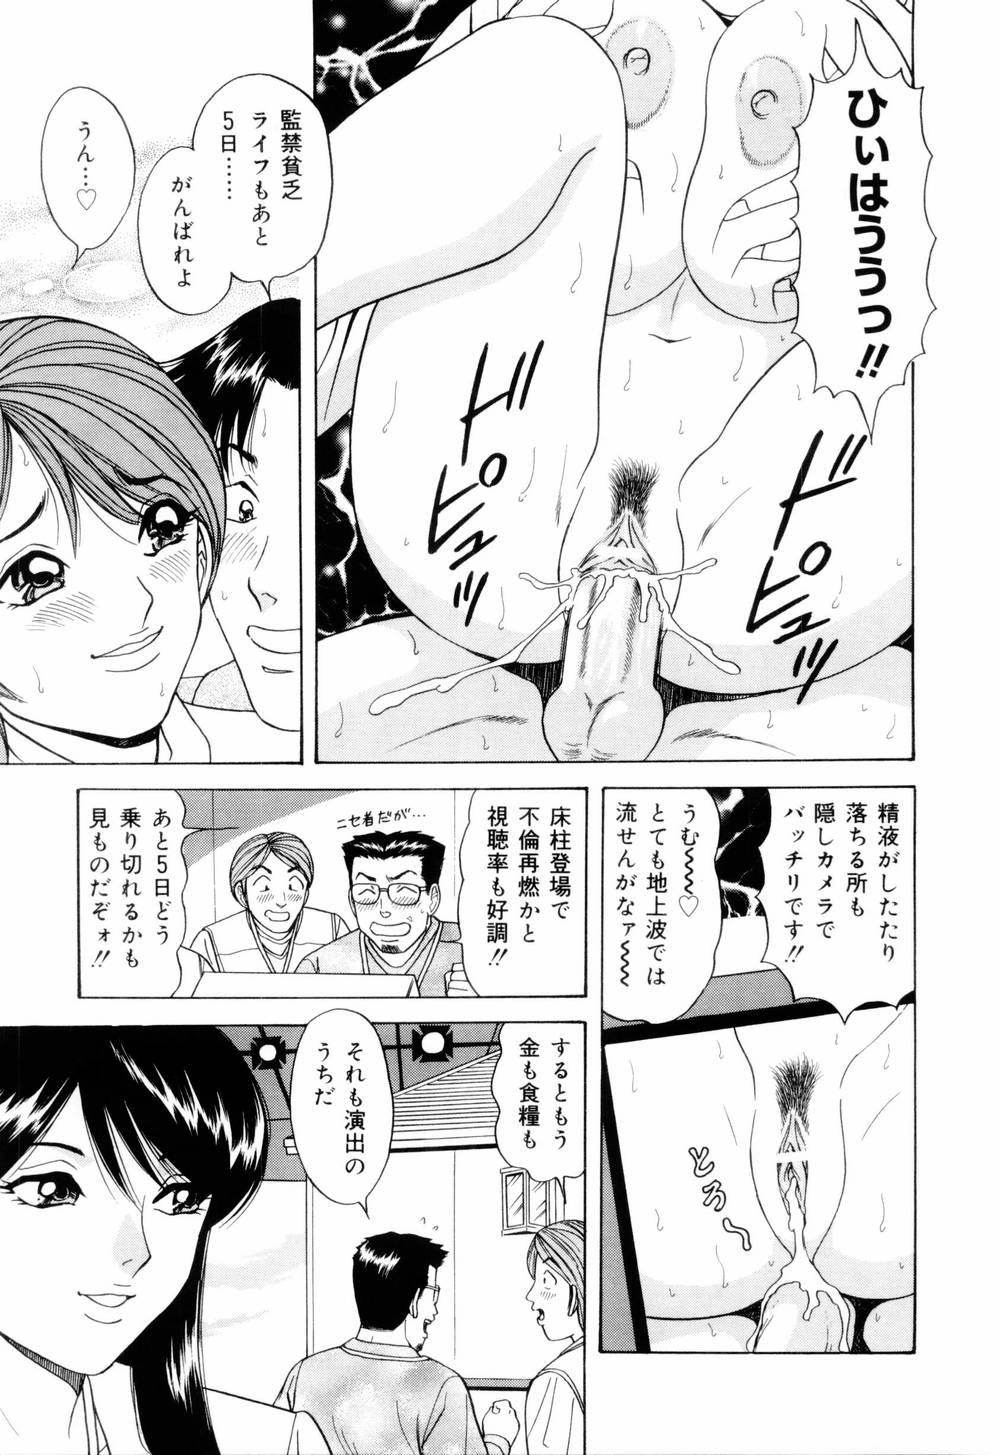 SuiCup Joshi Announcer Jikkyo Chukei Rape 44